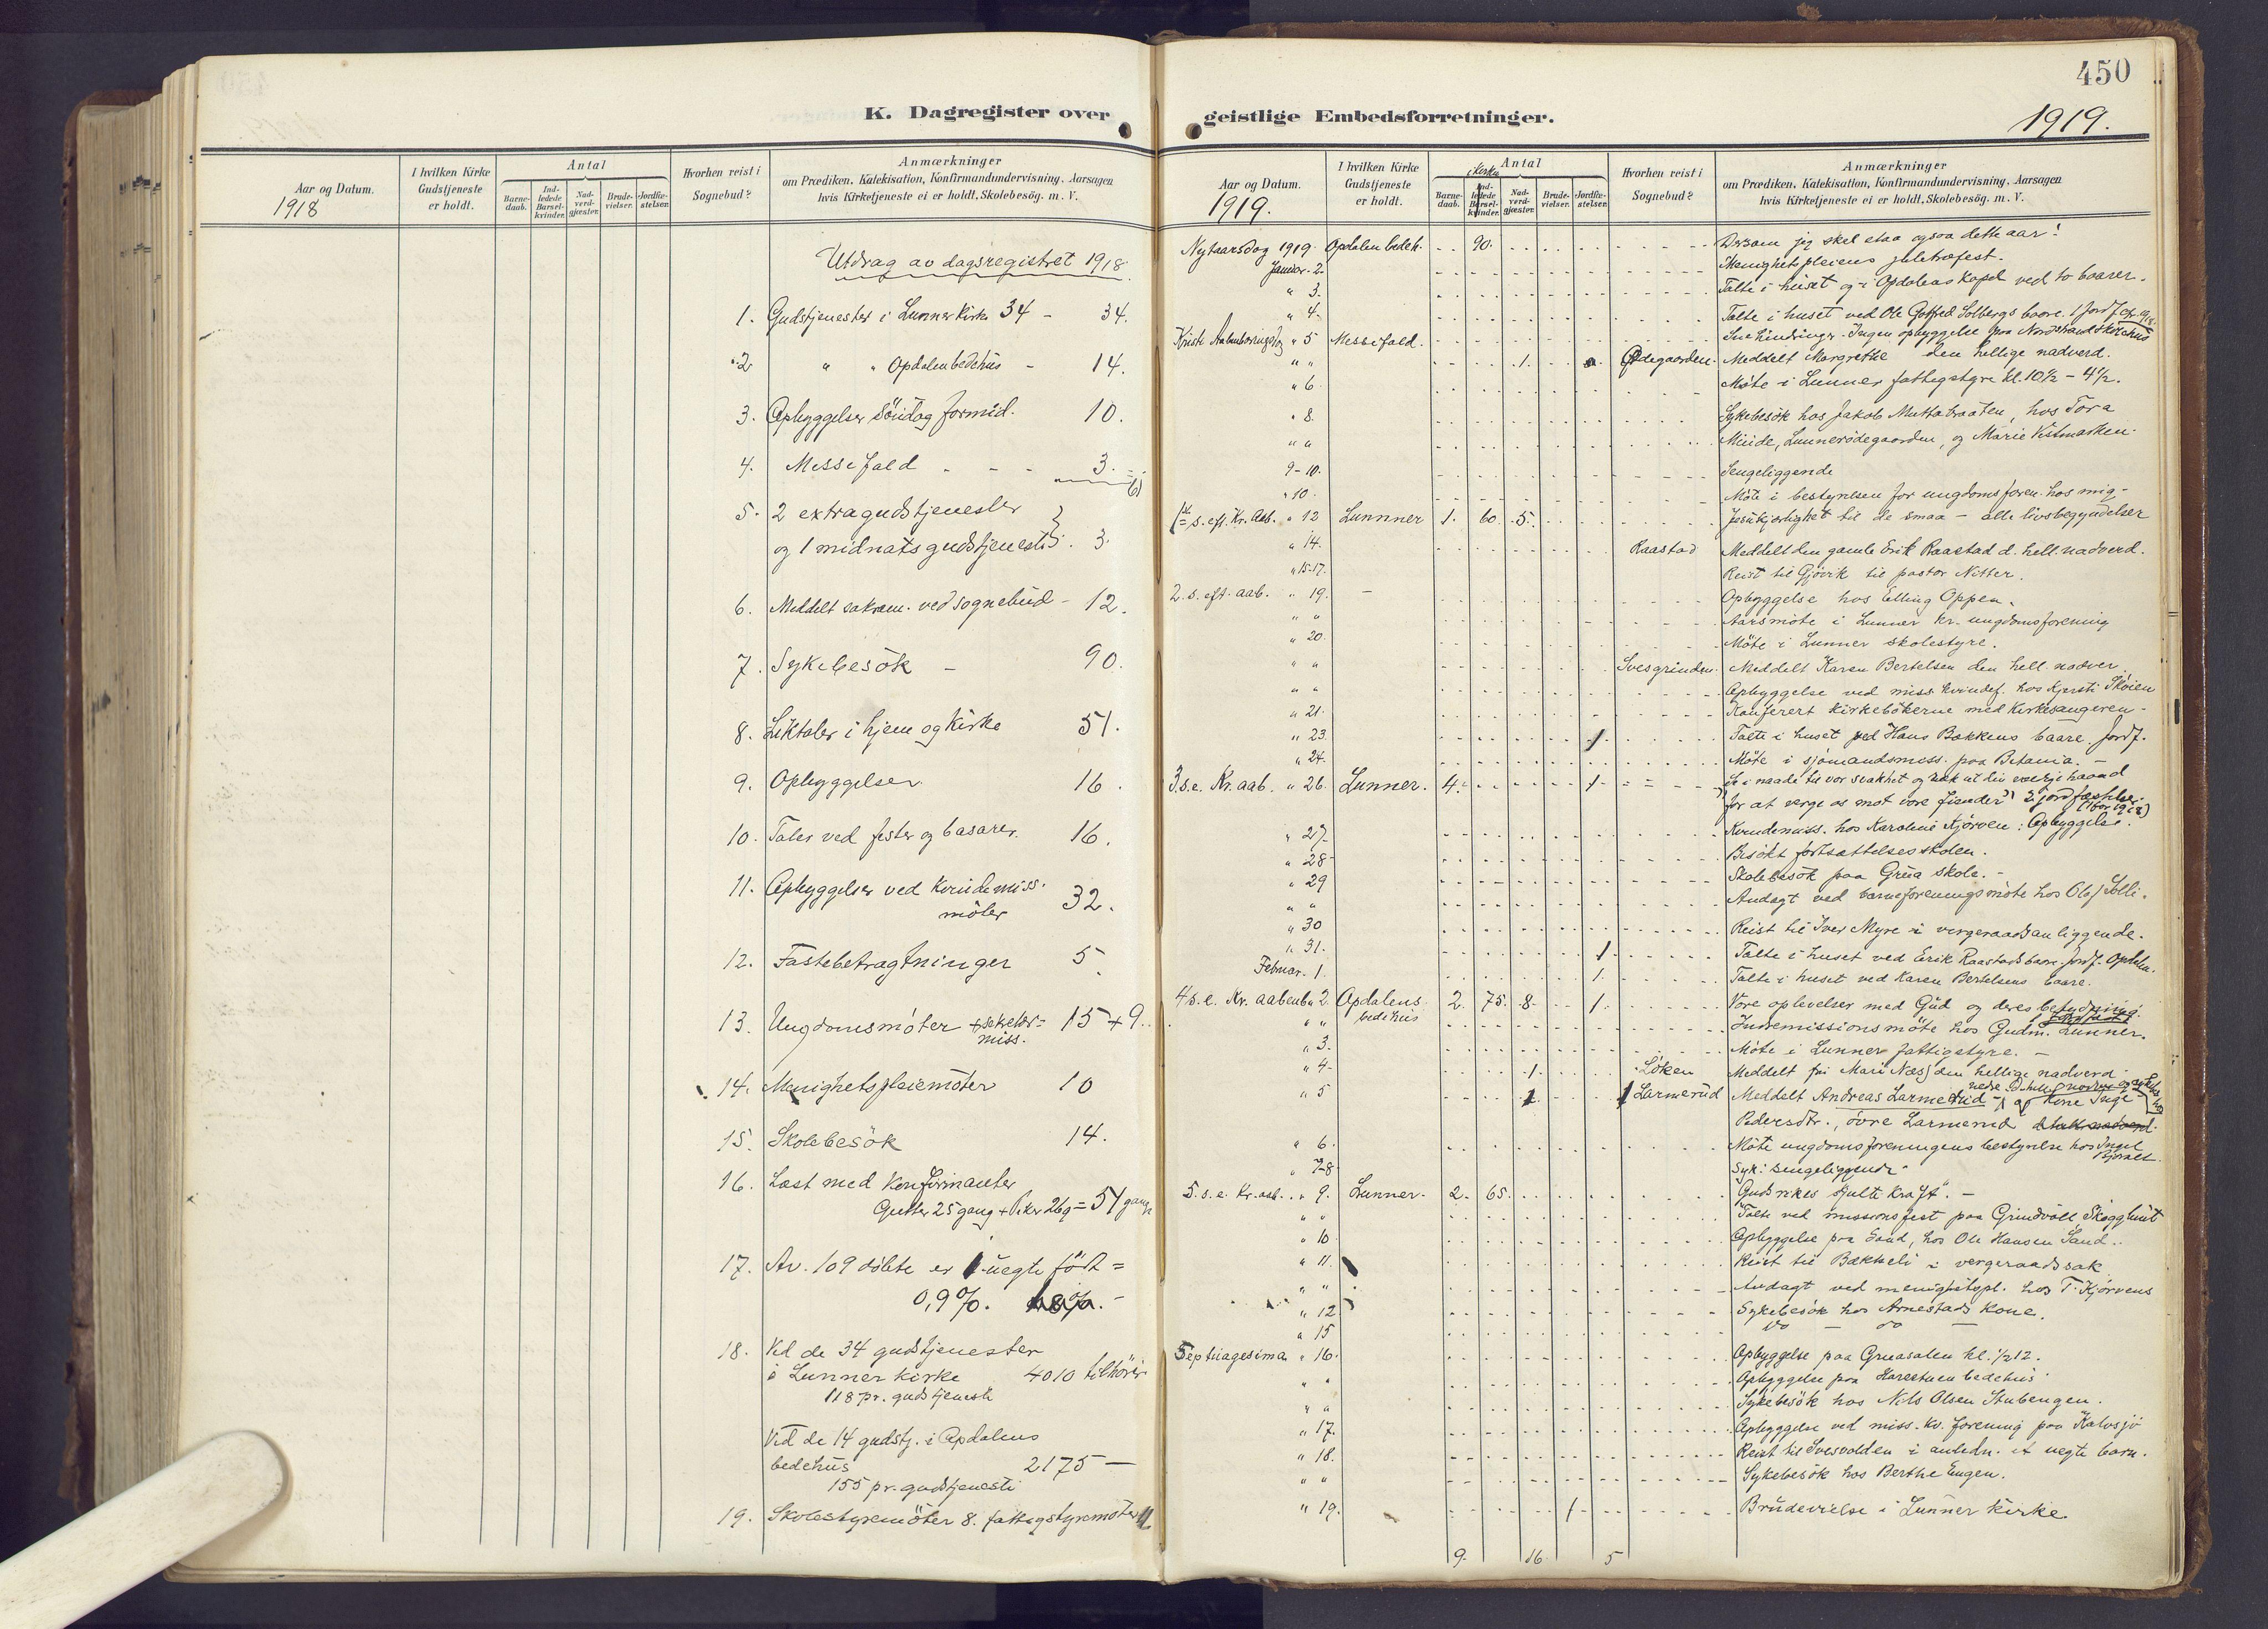 SAH, Lunner prestekontor, H/Ha/Haa/L0001: Ministerialbok nr. 1, 1907-1922, s. 450